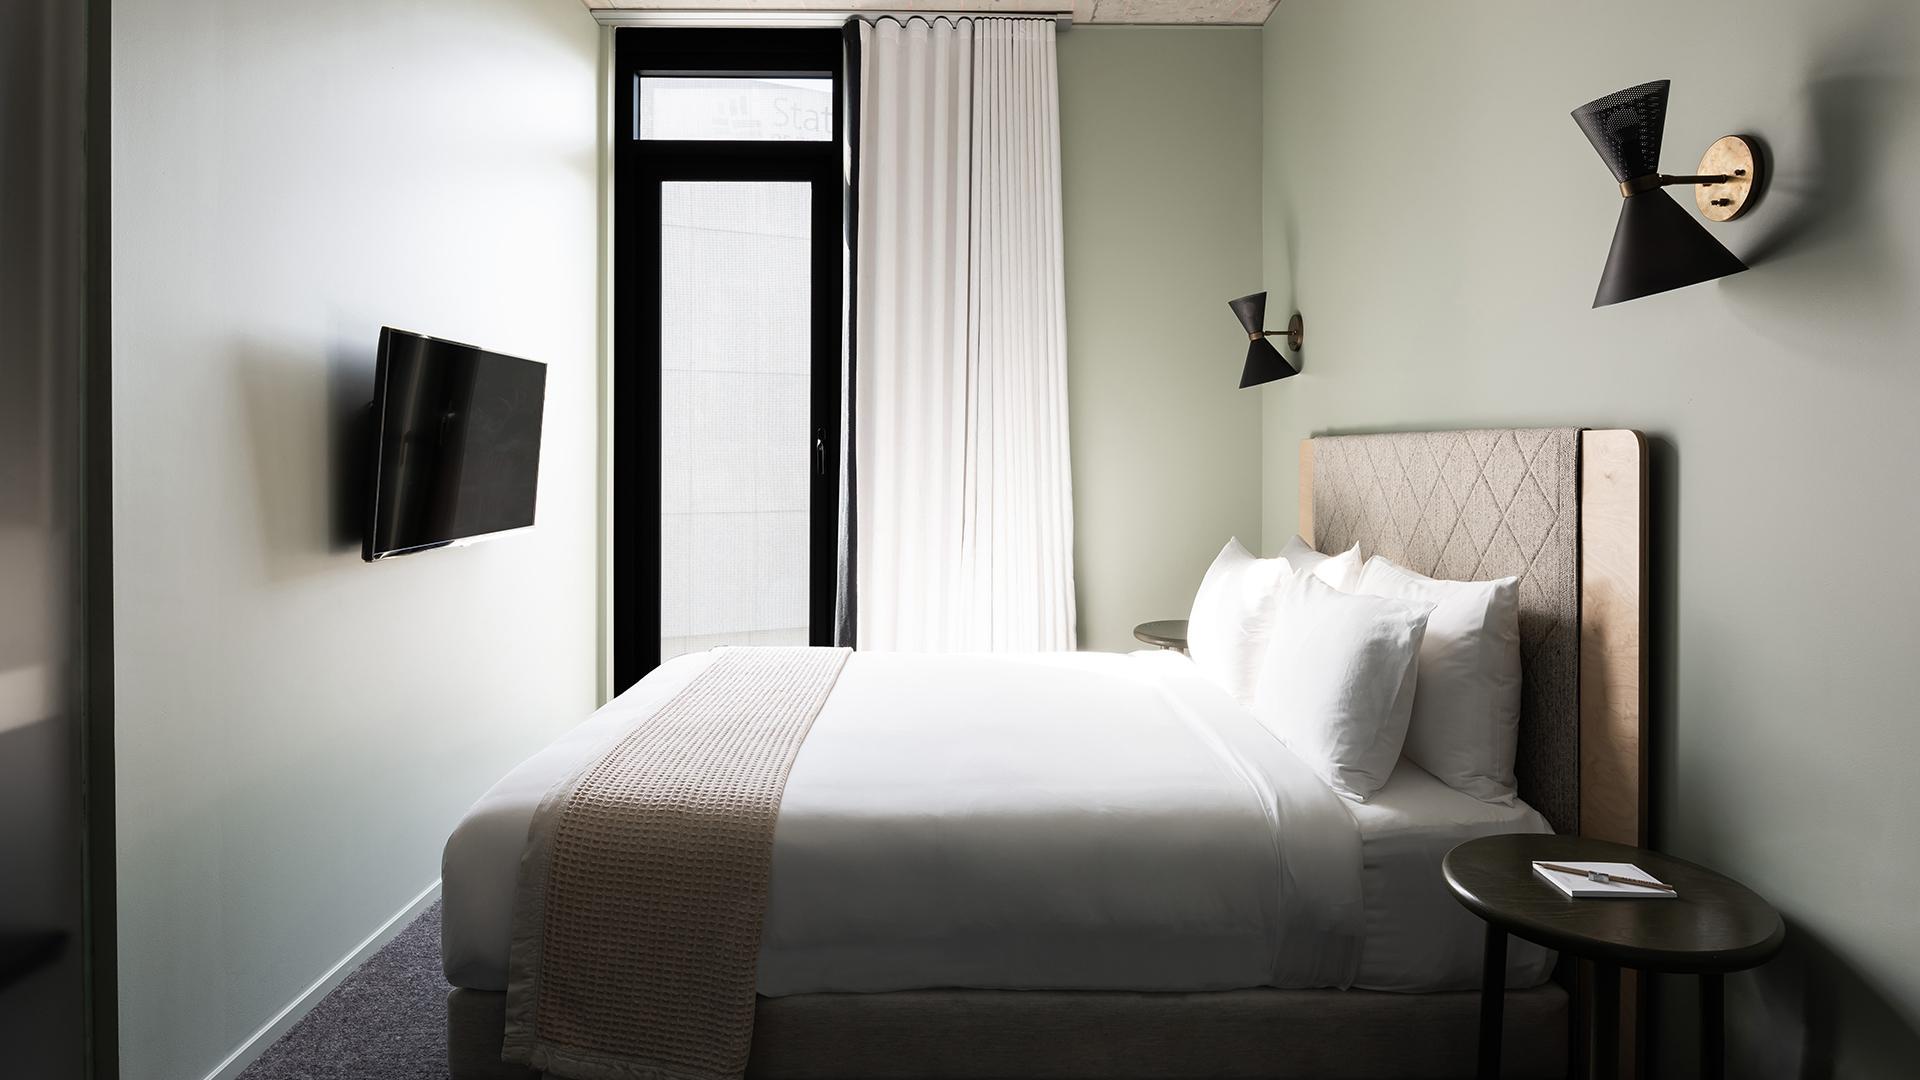 Small image 1 at Alex Hotel Perth by City of Perth, Western Australia, Australia